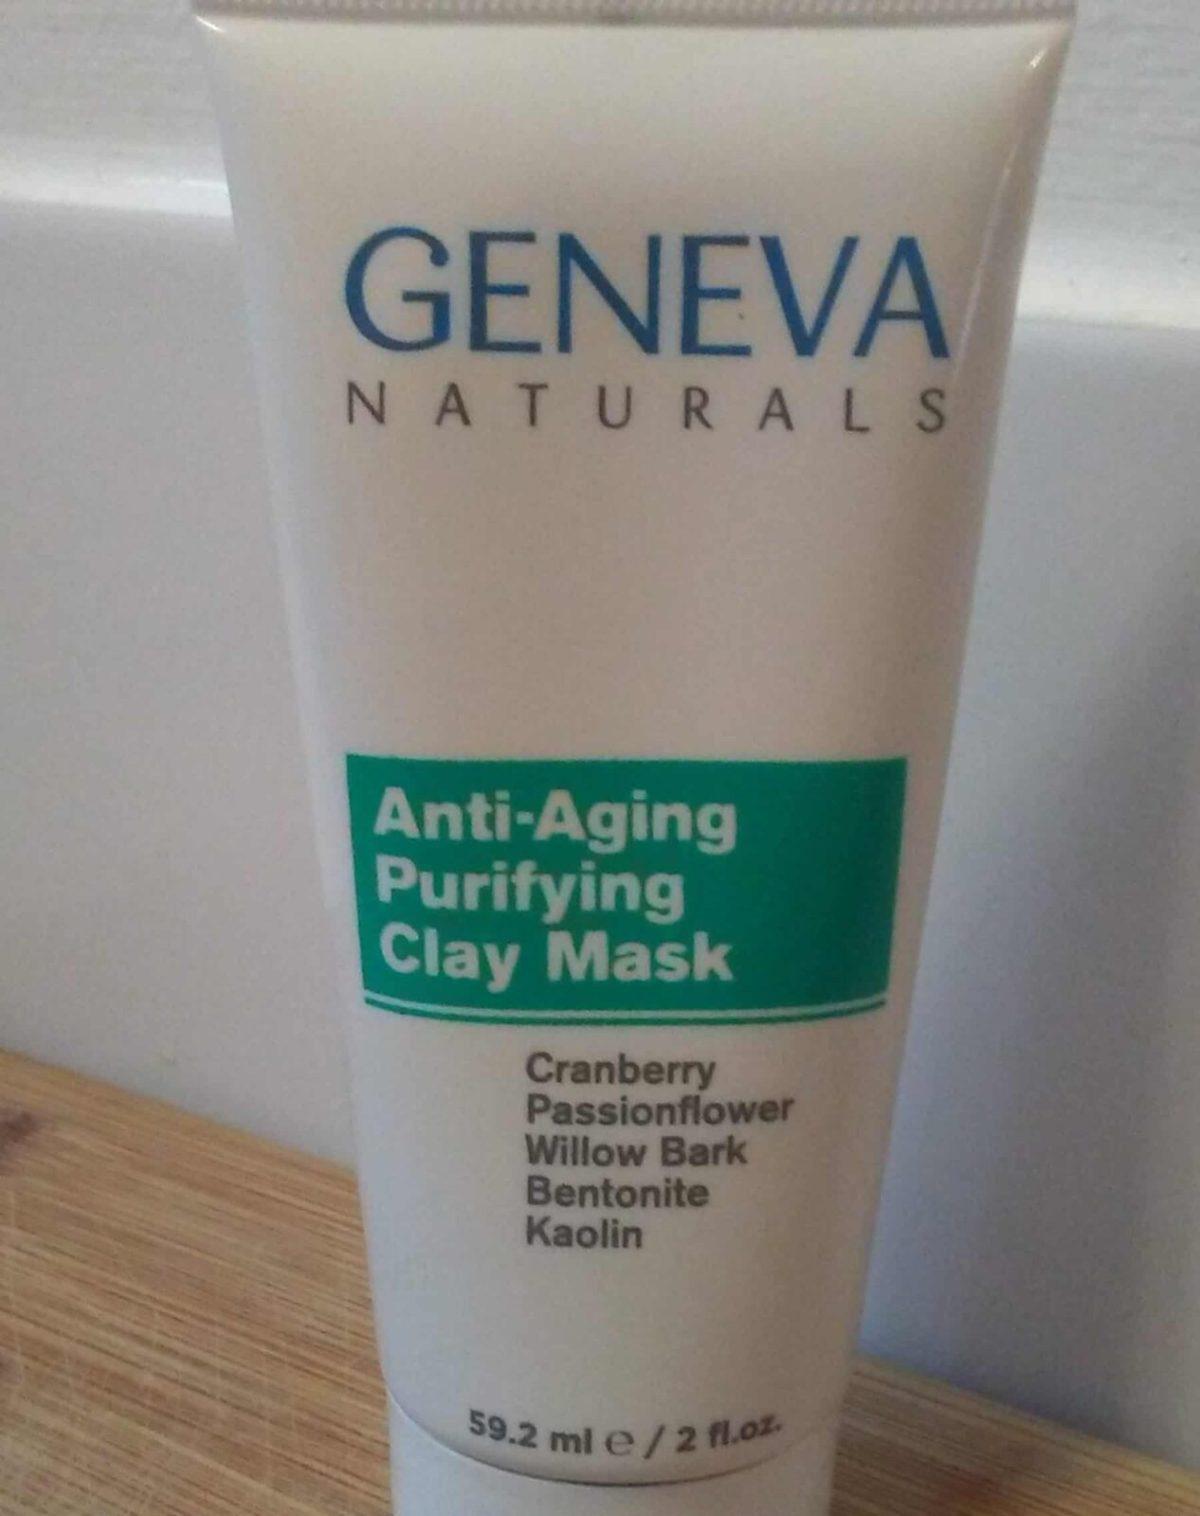 Geneva Naturals Anti-Aging Purifying Clay Mask Review